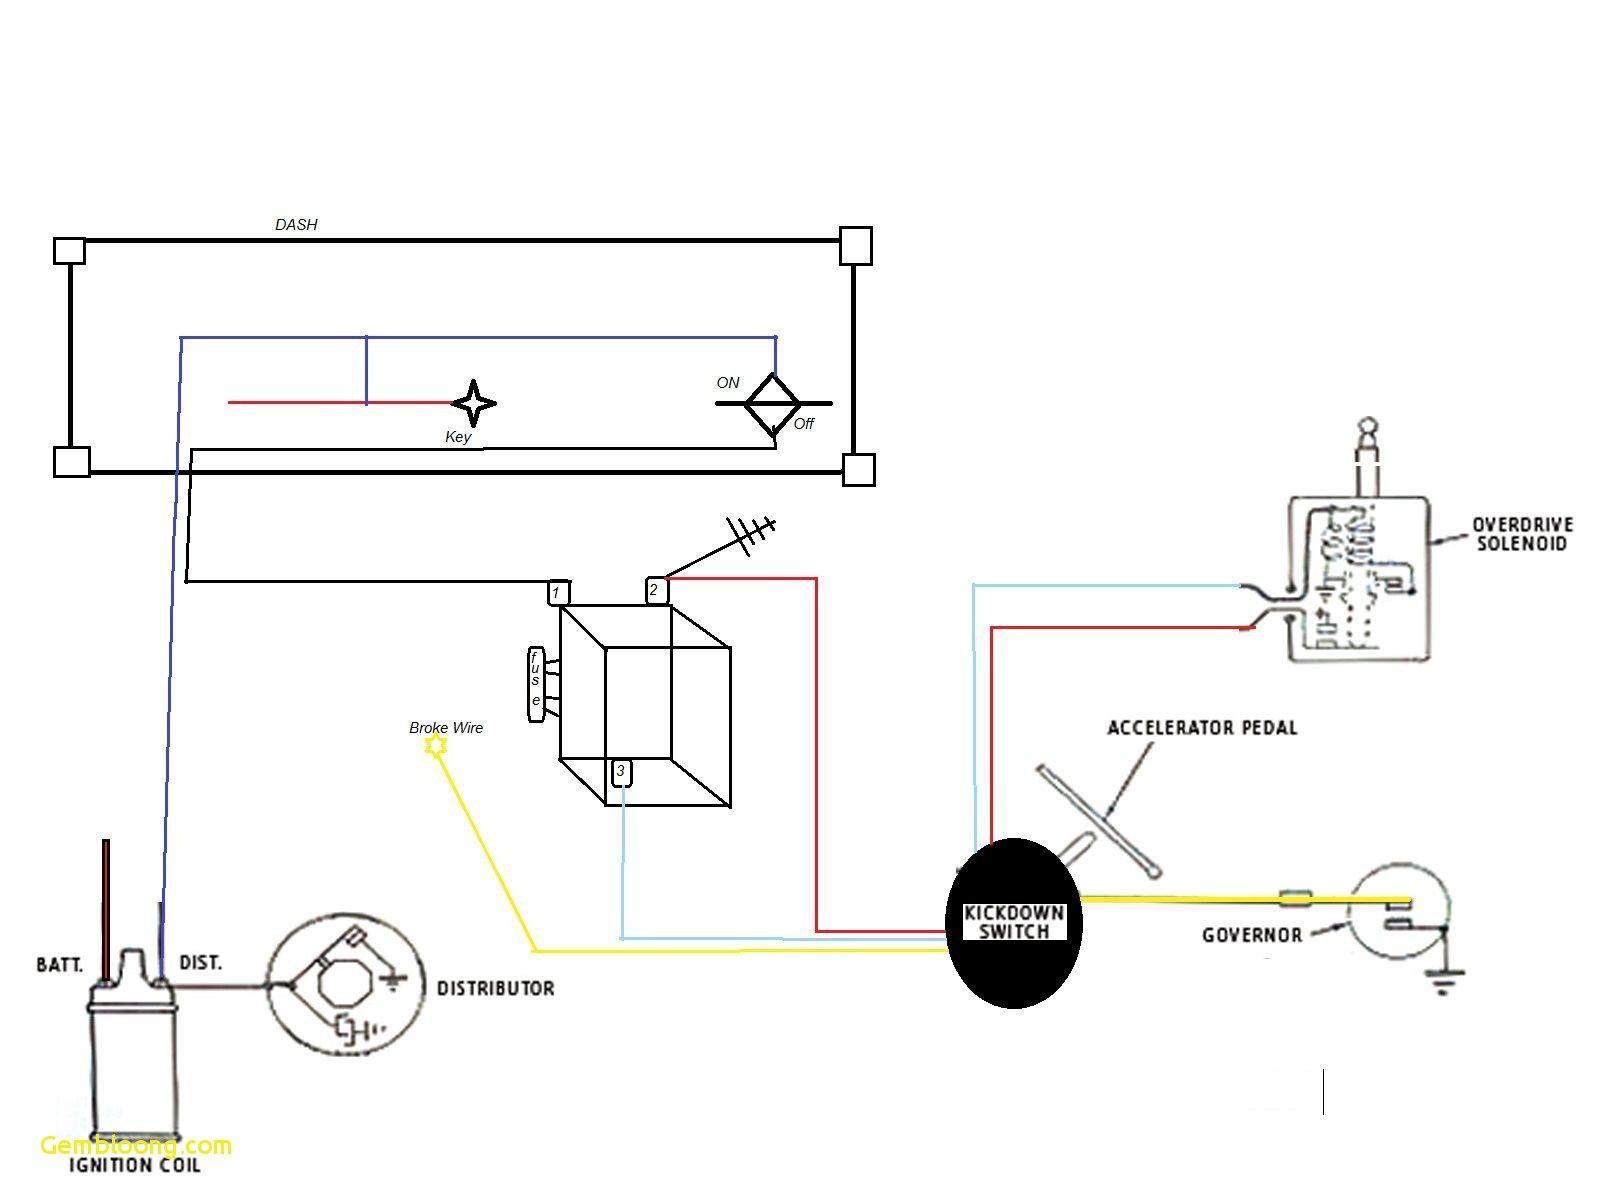 Dodge Ignition Wiring Diagram